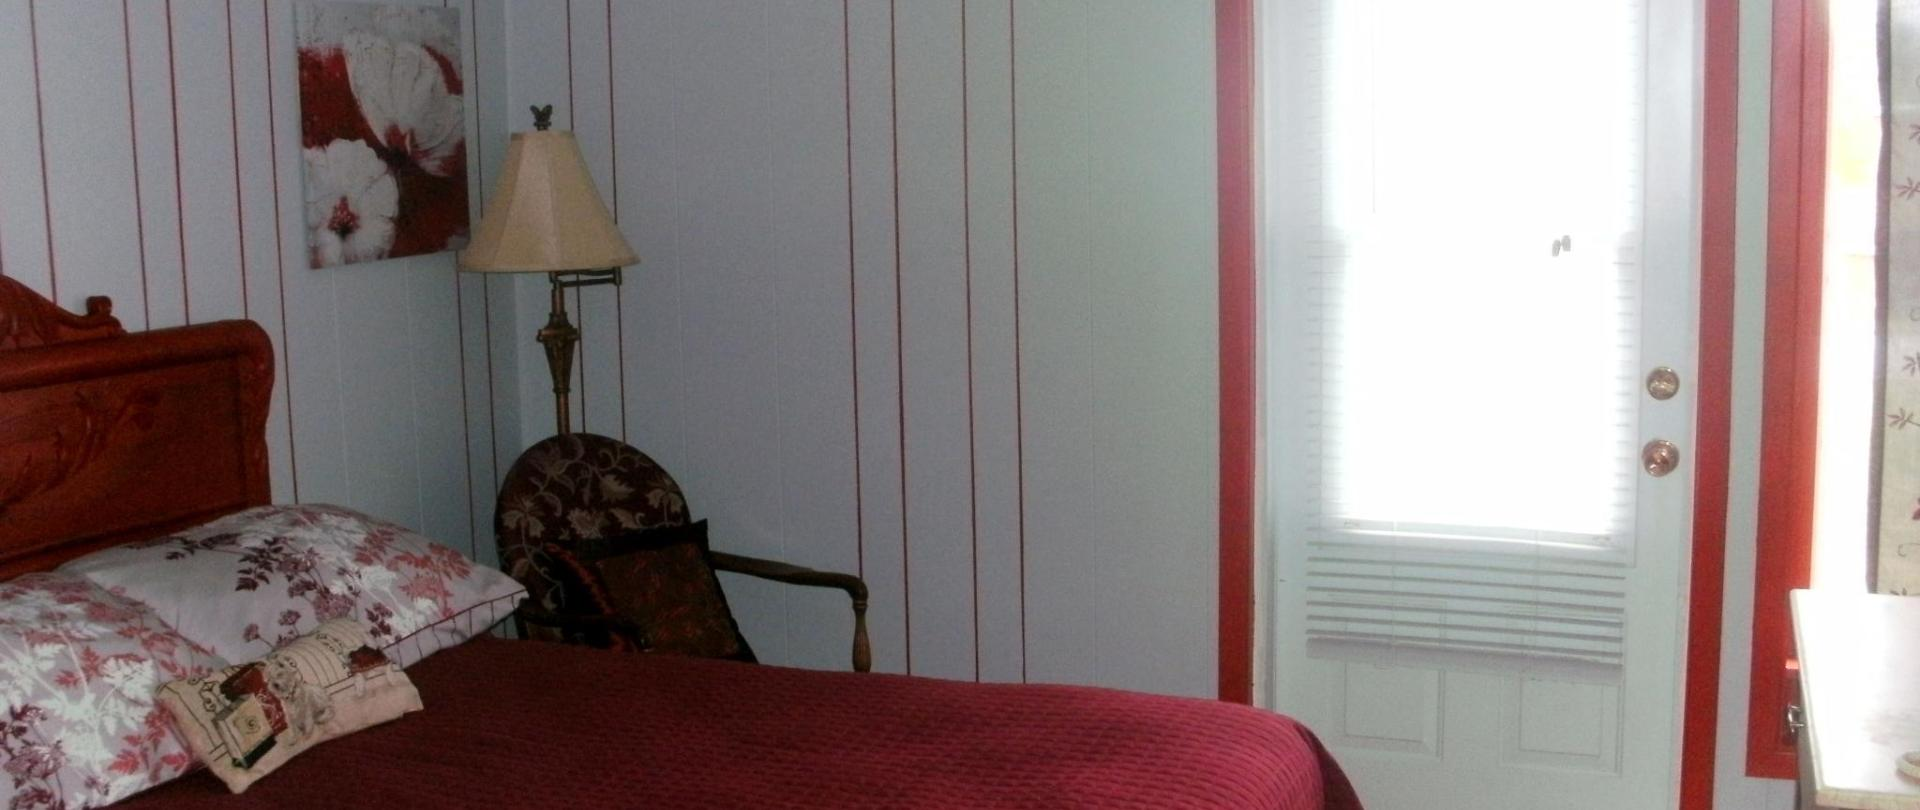 chambre 9 et 10 012.JPG